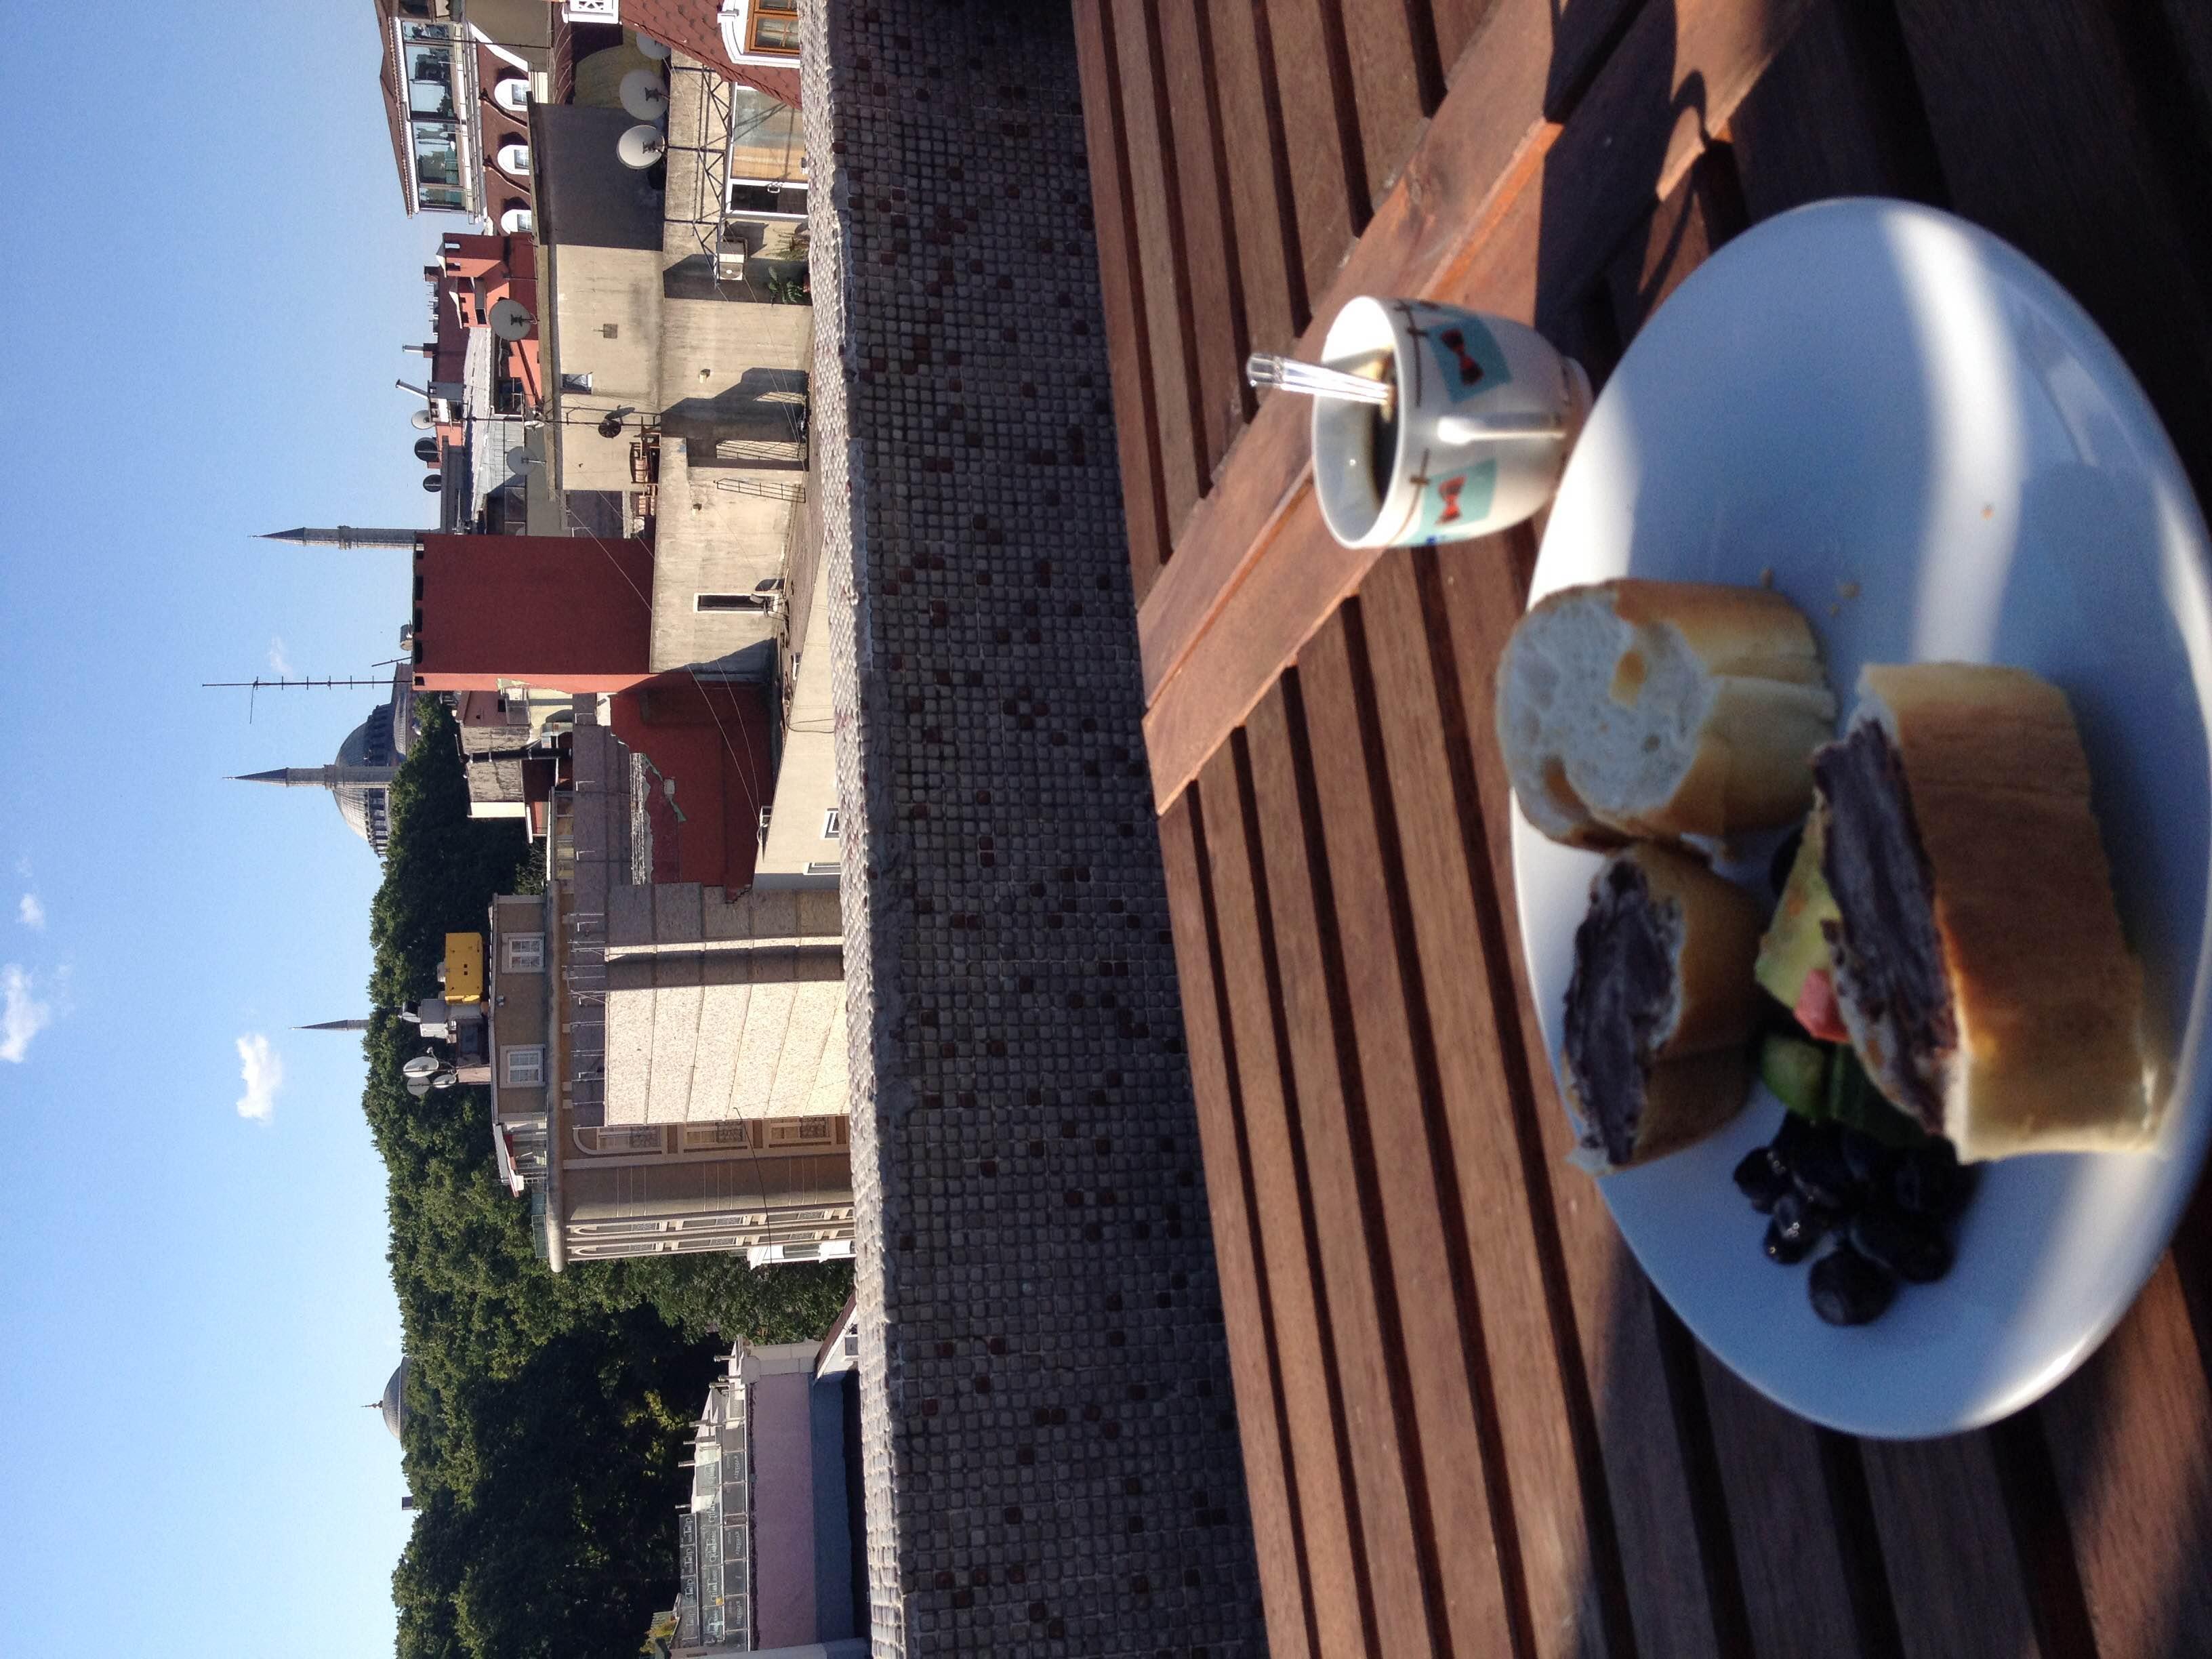 One last breakfast in the shadow of Hagia Sophia